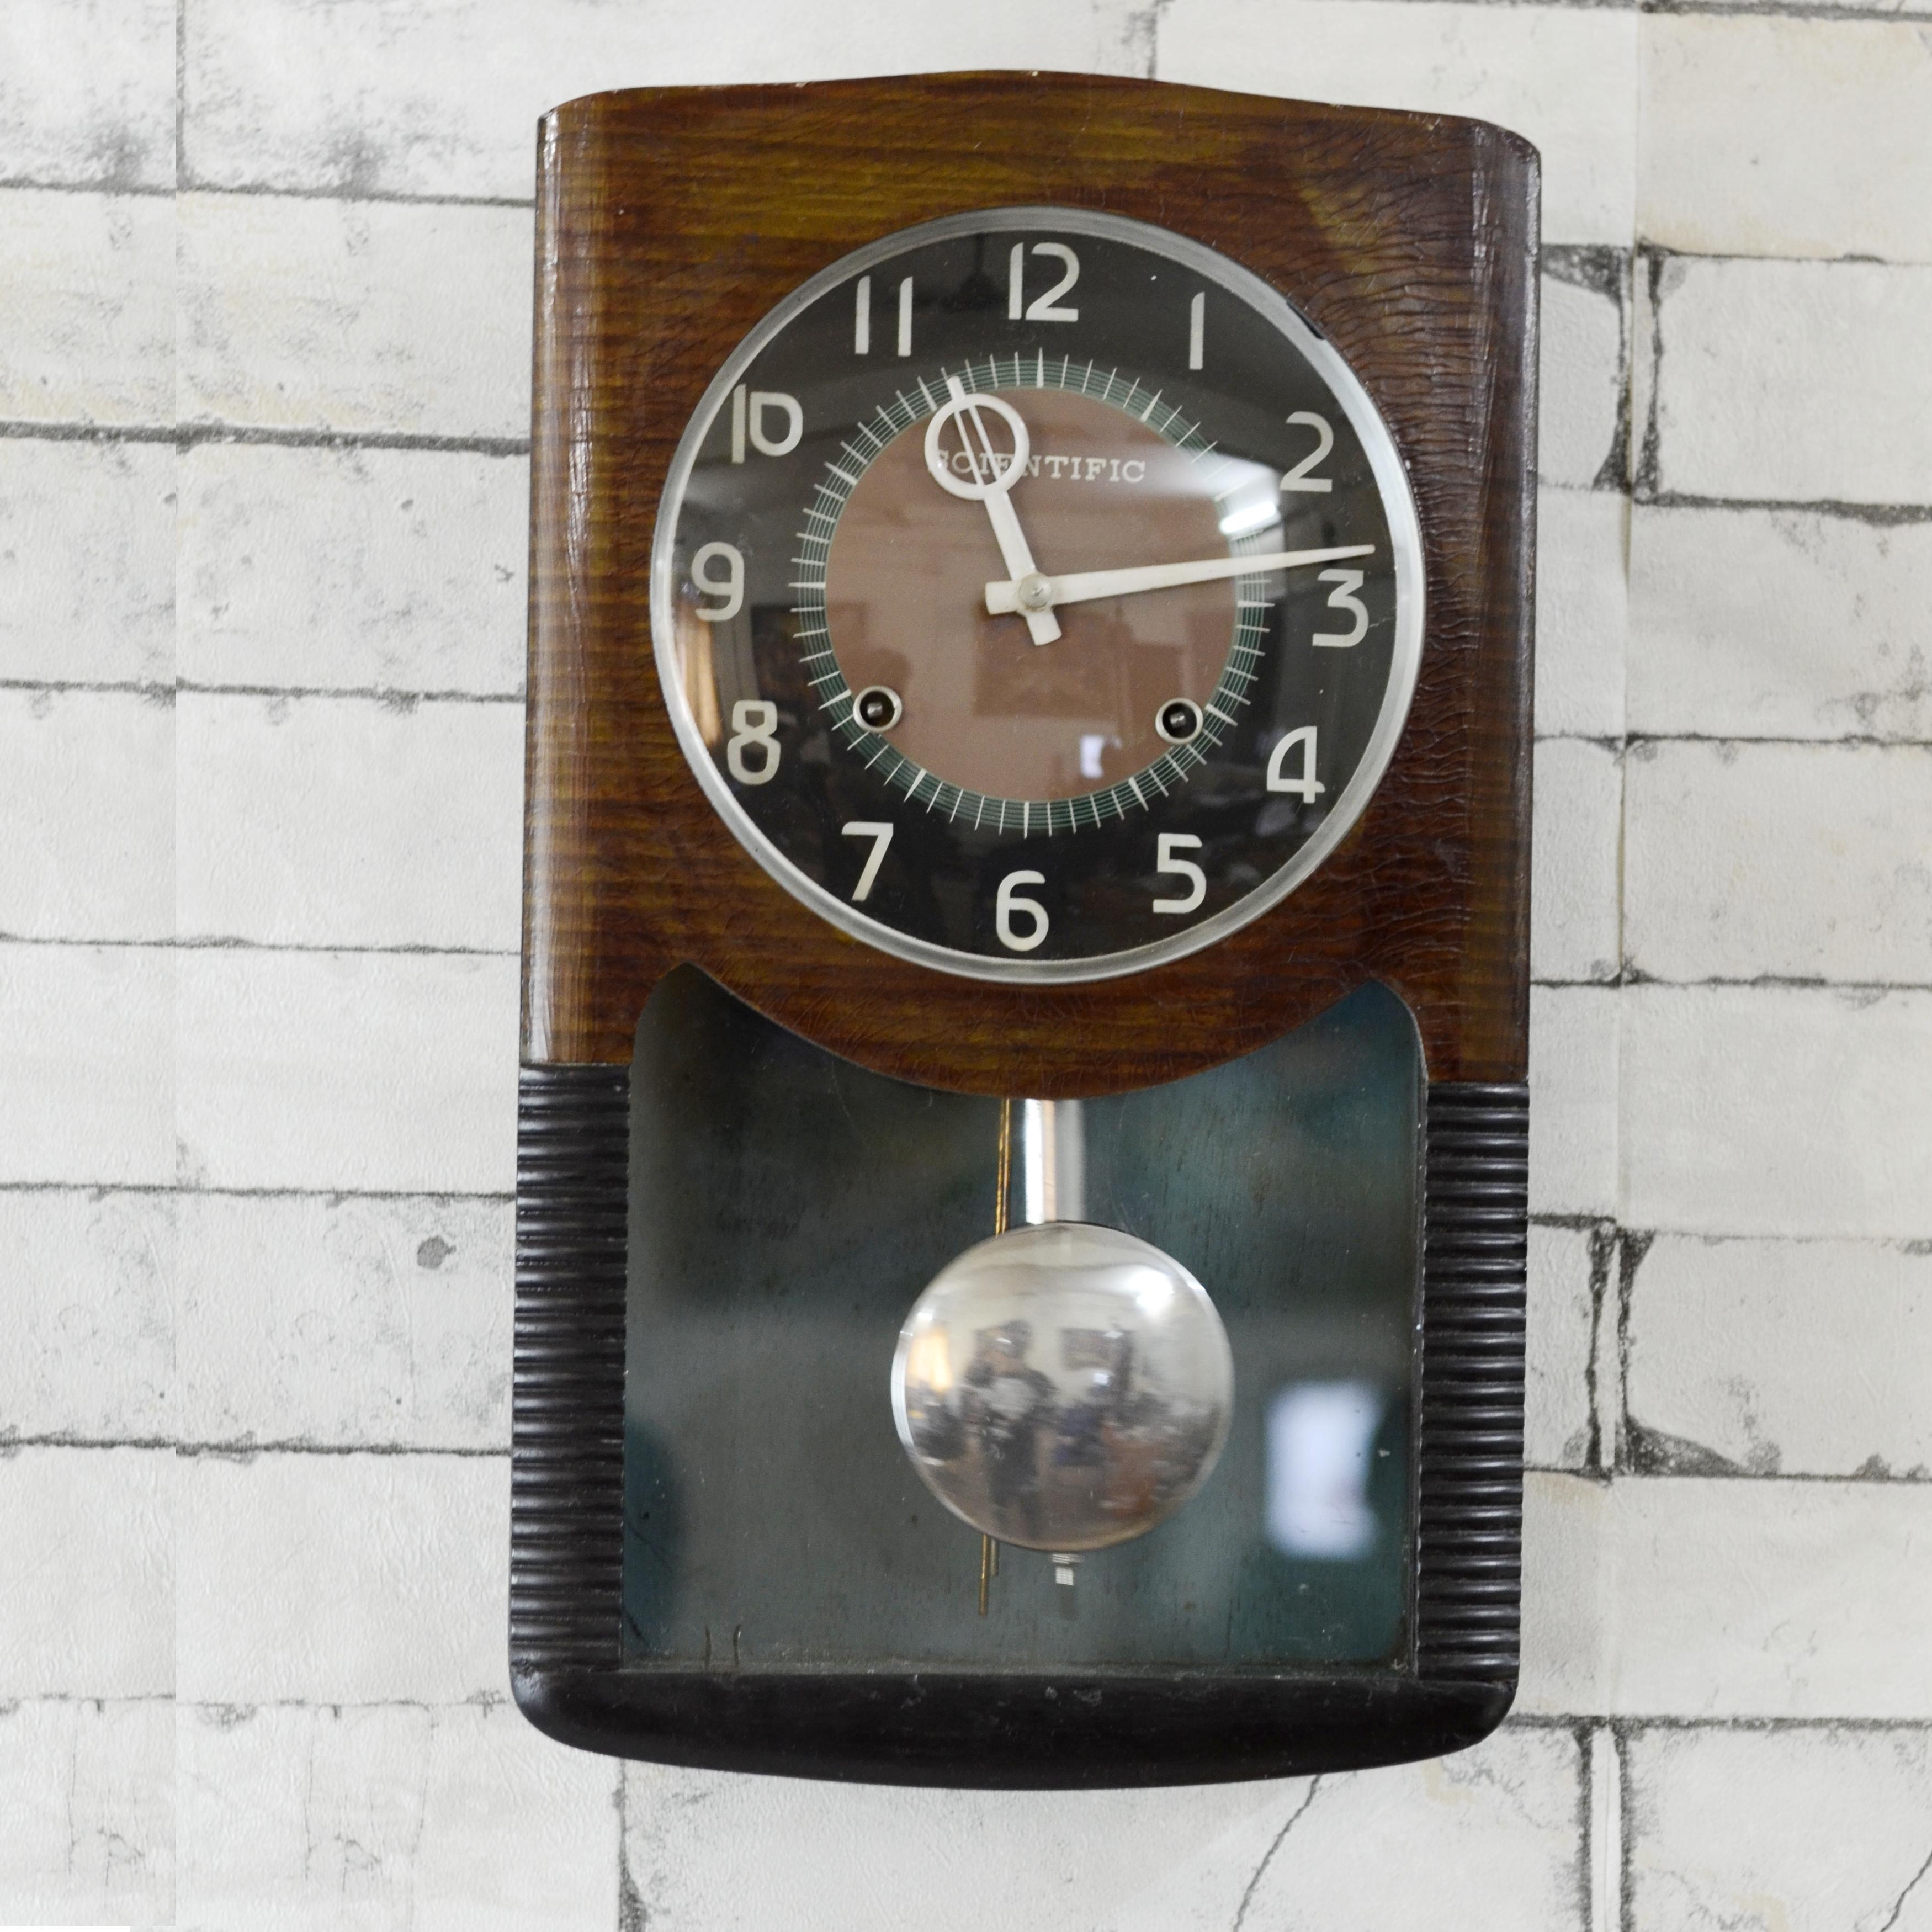 Original antique wall clocks 12000 wall clocks hover to zoom antikcart original antique working scientific bim bam clock wall amipublicfo Gallery